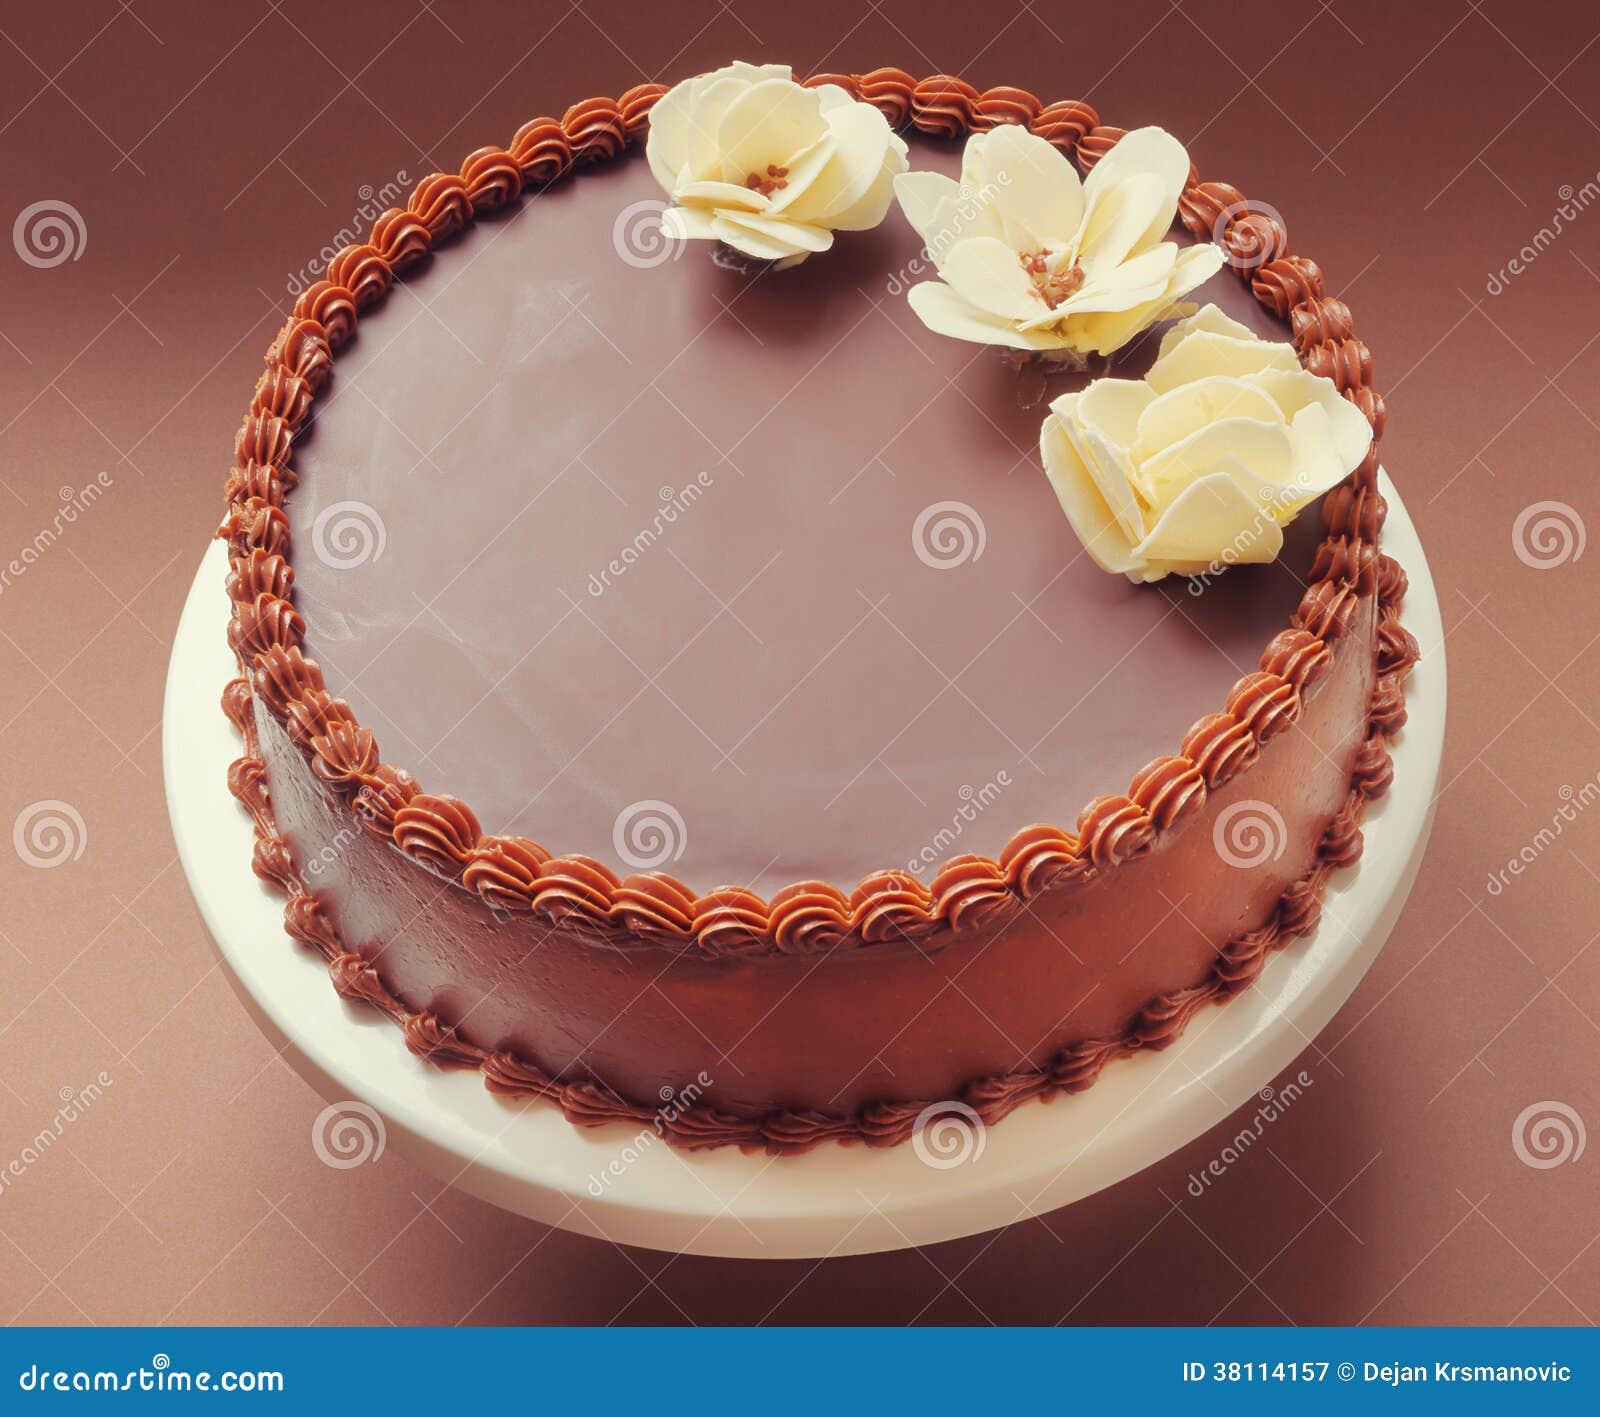 Chocolate Birthday Cake Royalty Free Stock Photography ...